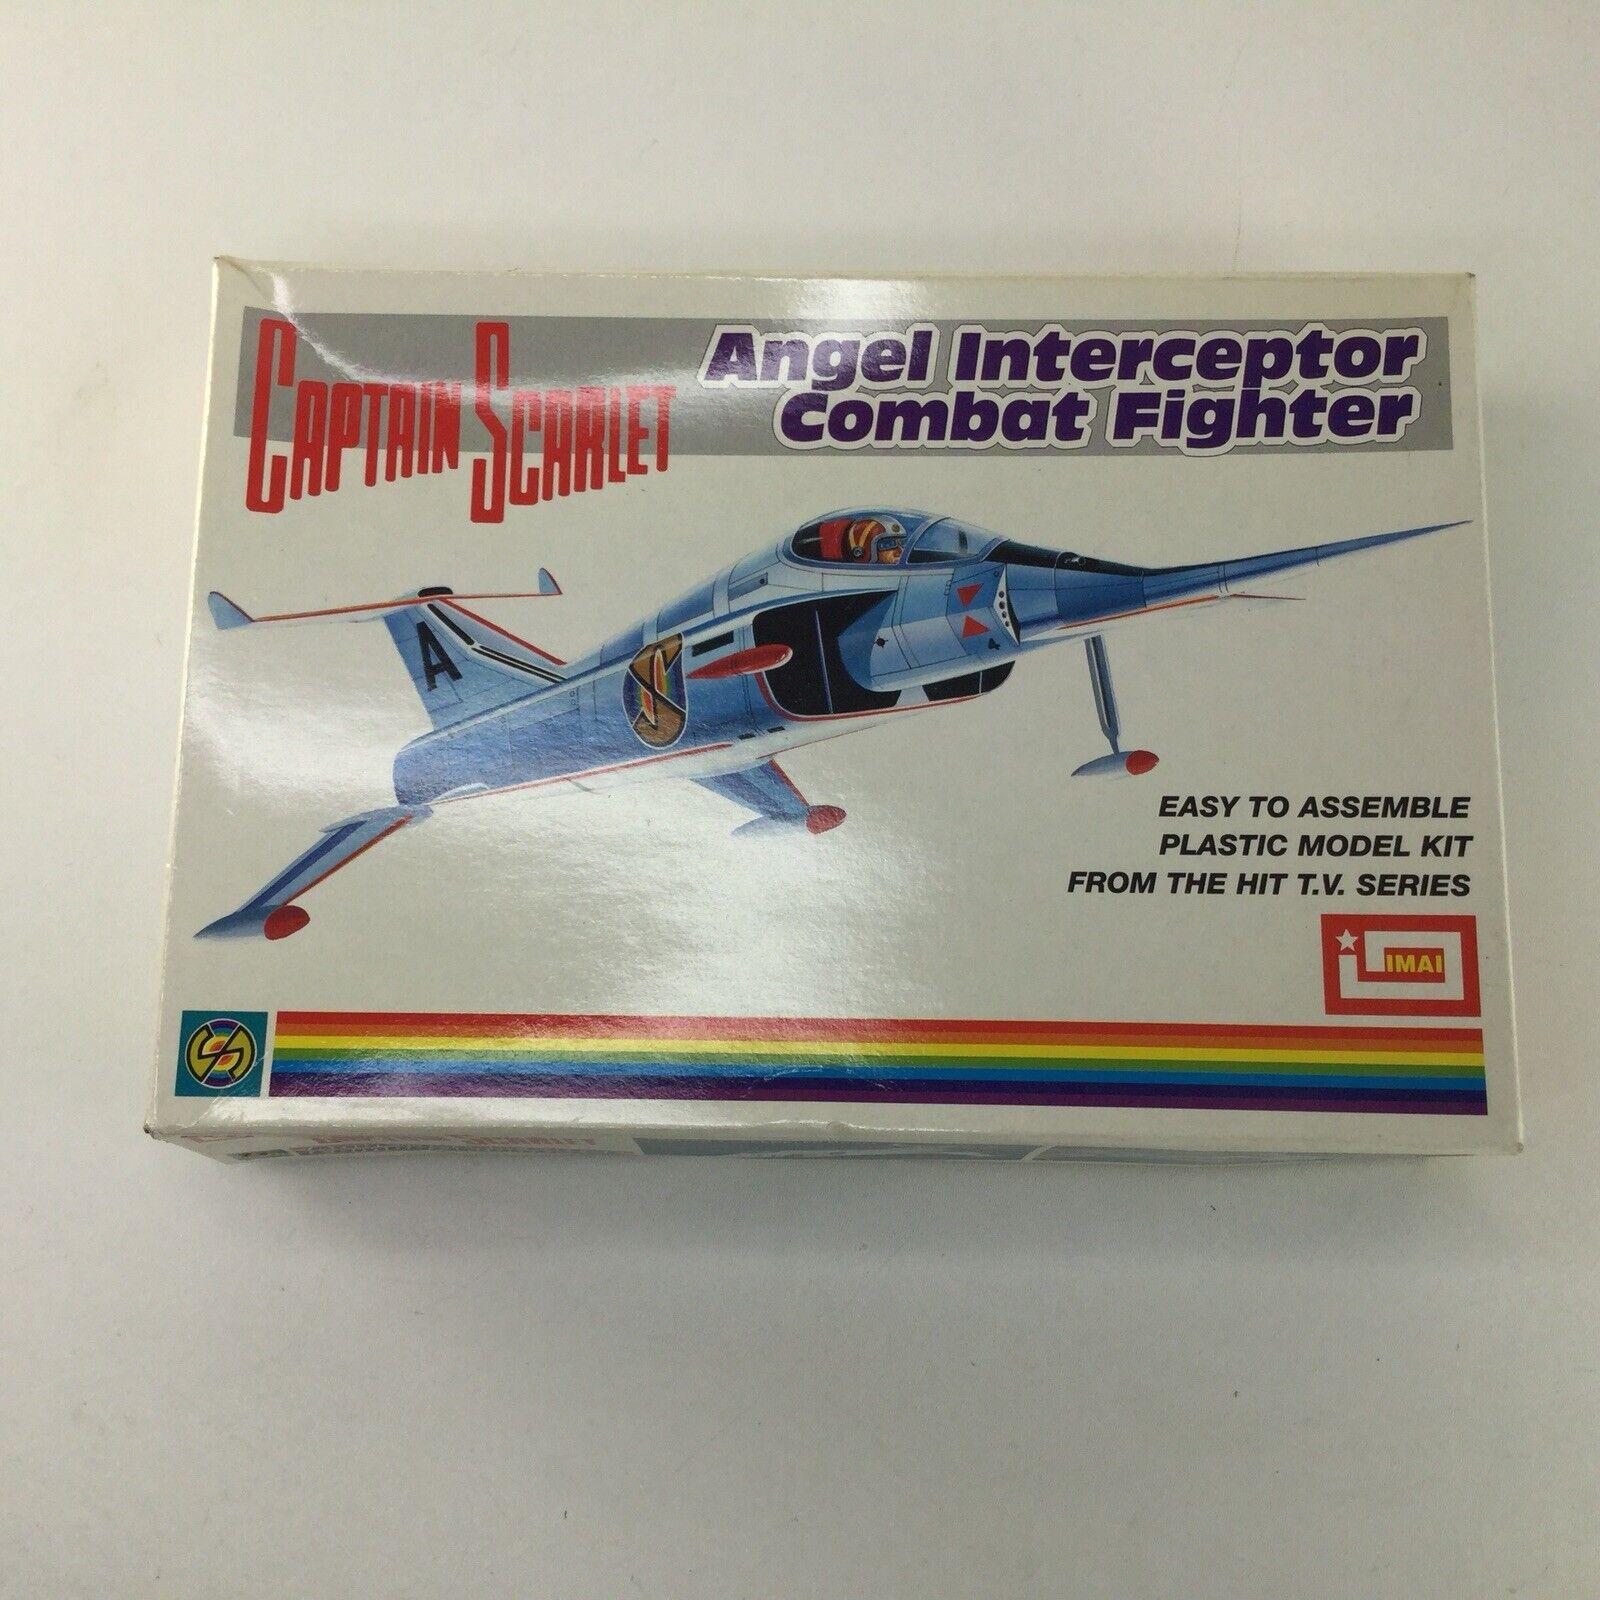 IMAI Captain Scarlet Angel Interceptor Plane Plastic Model Kit Brand New Unused